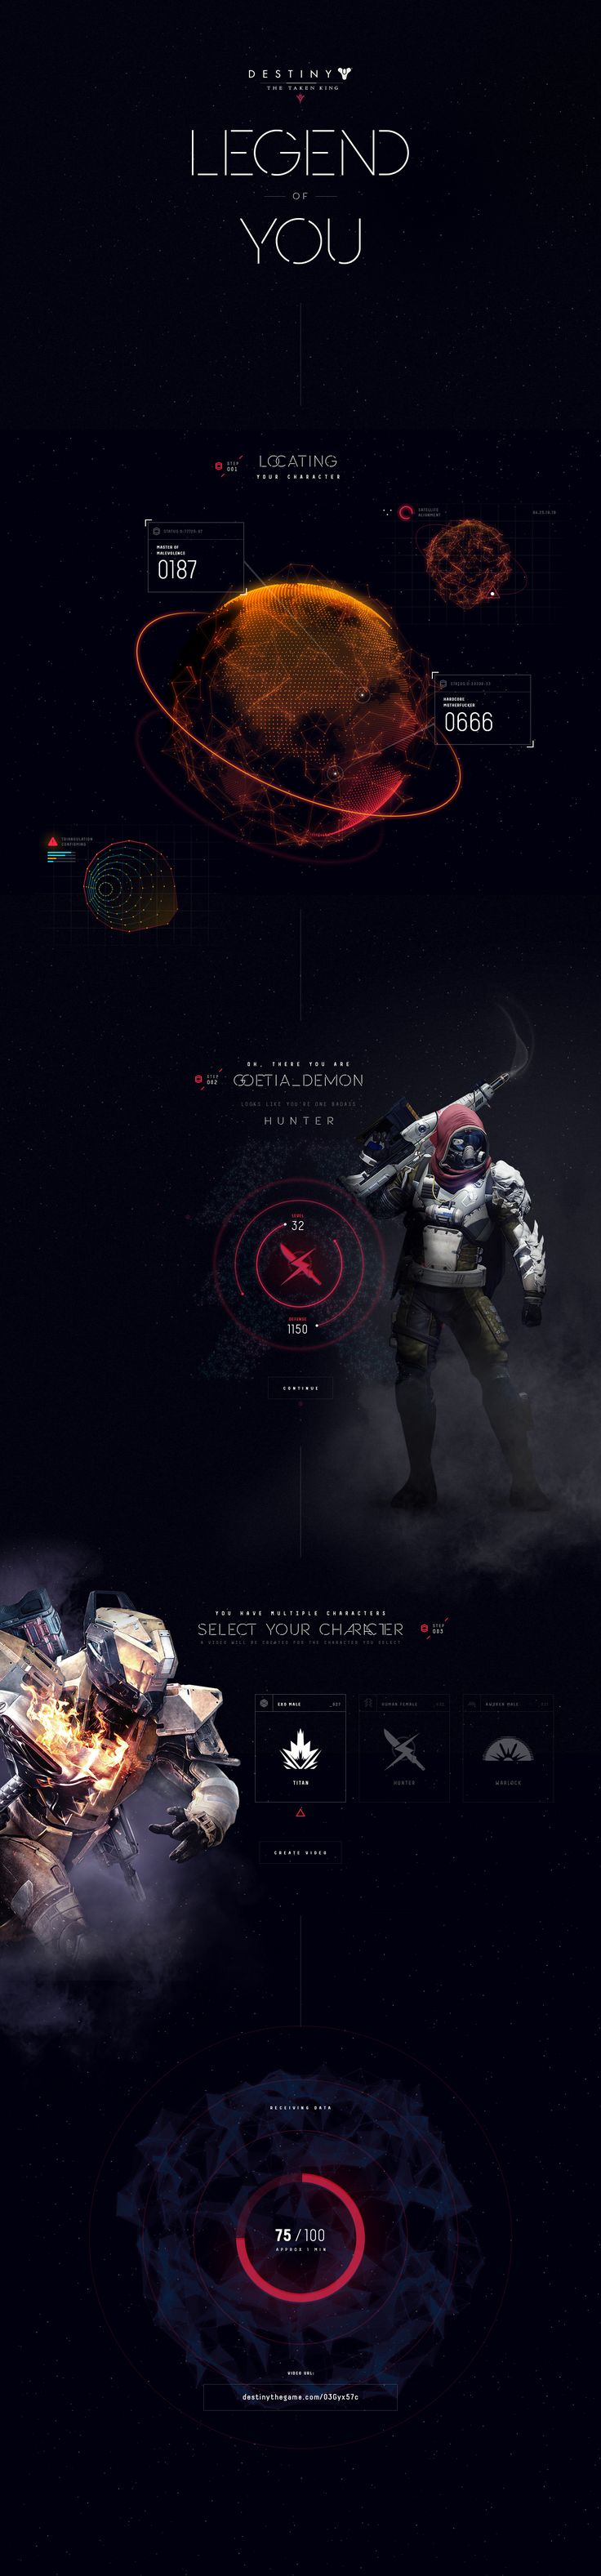 Destiny: Legend of You on Behance